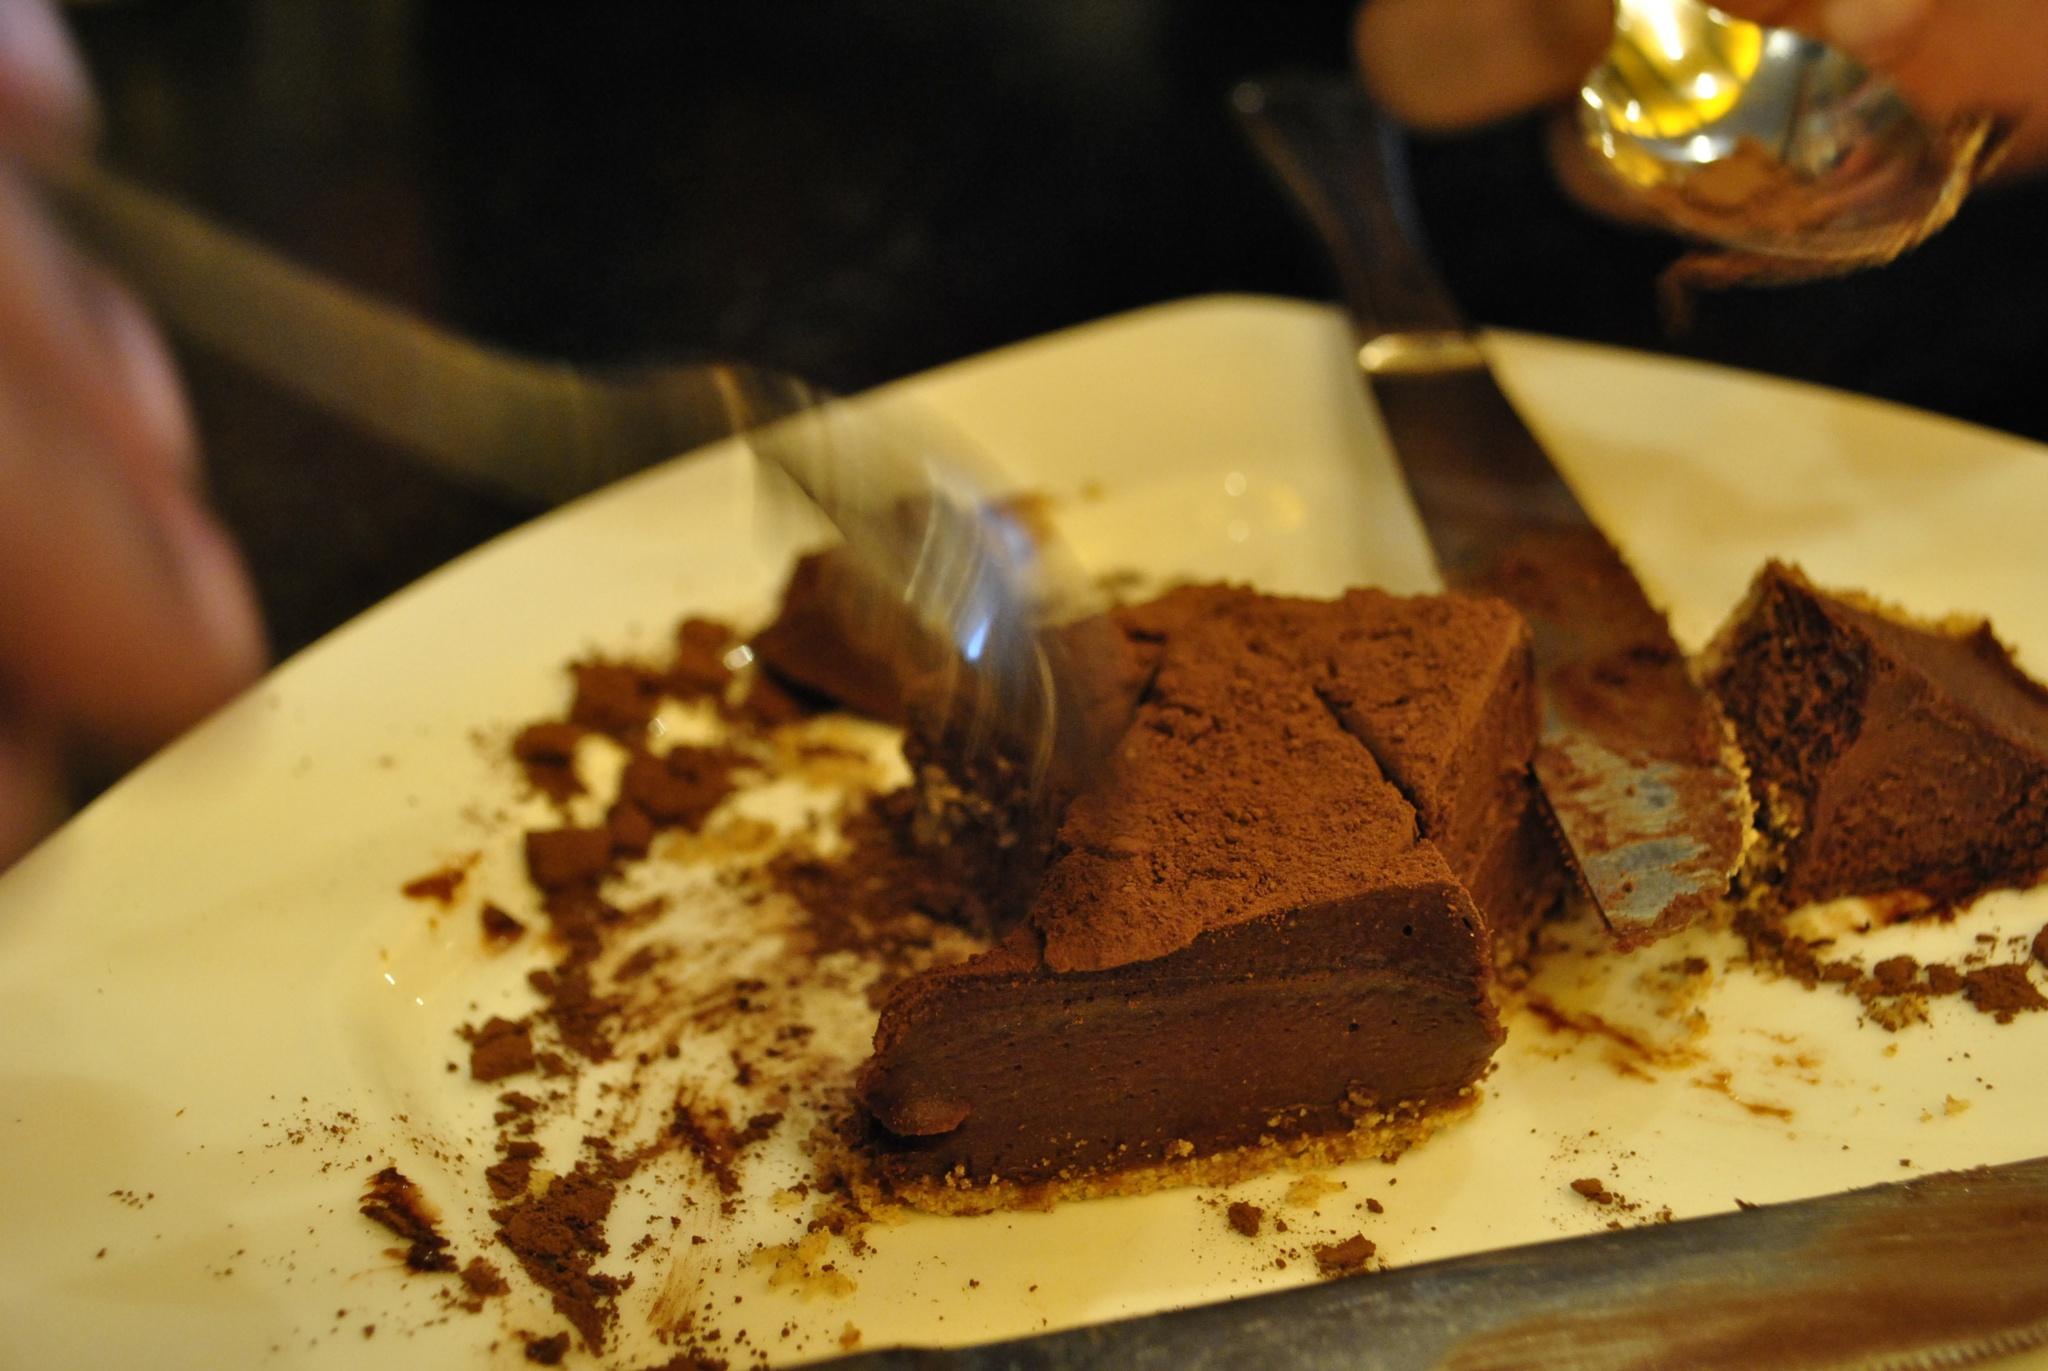 Eggless Chocolate Cheesecake  by Jyoti P. Deka